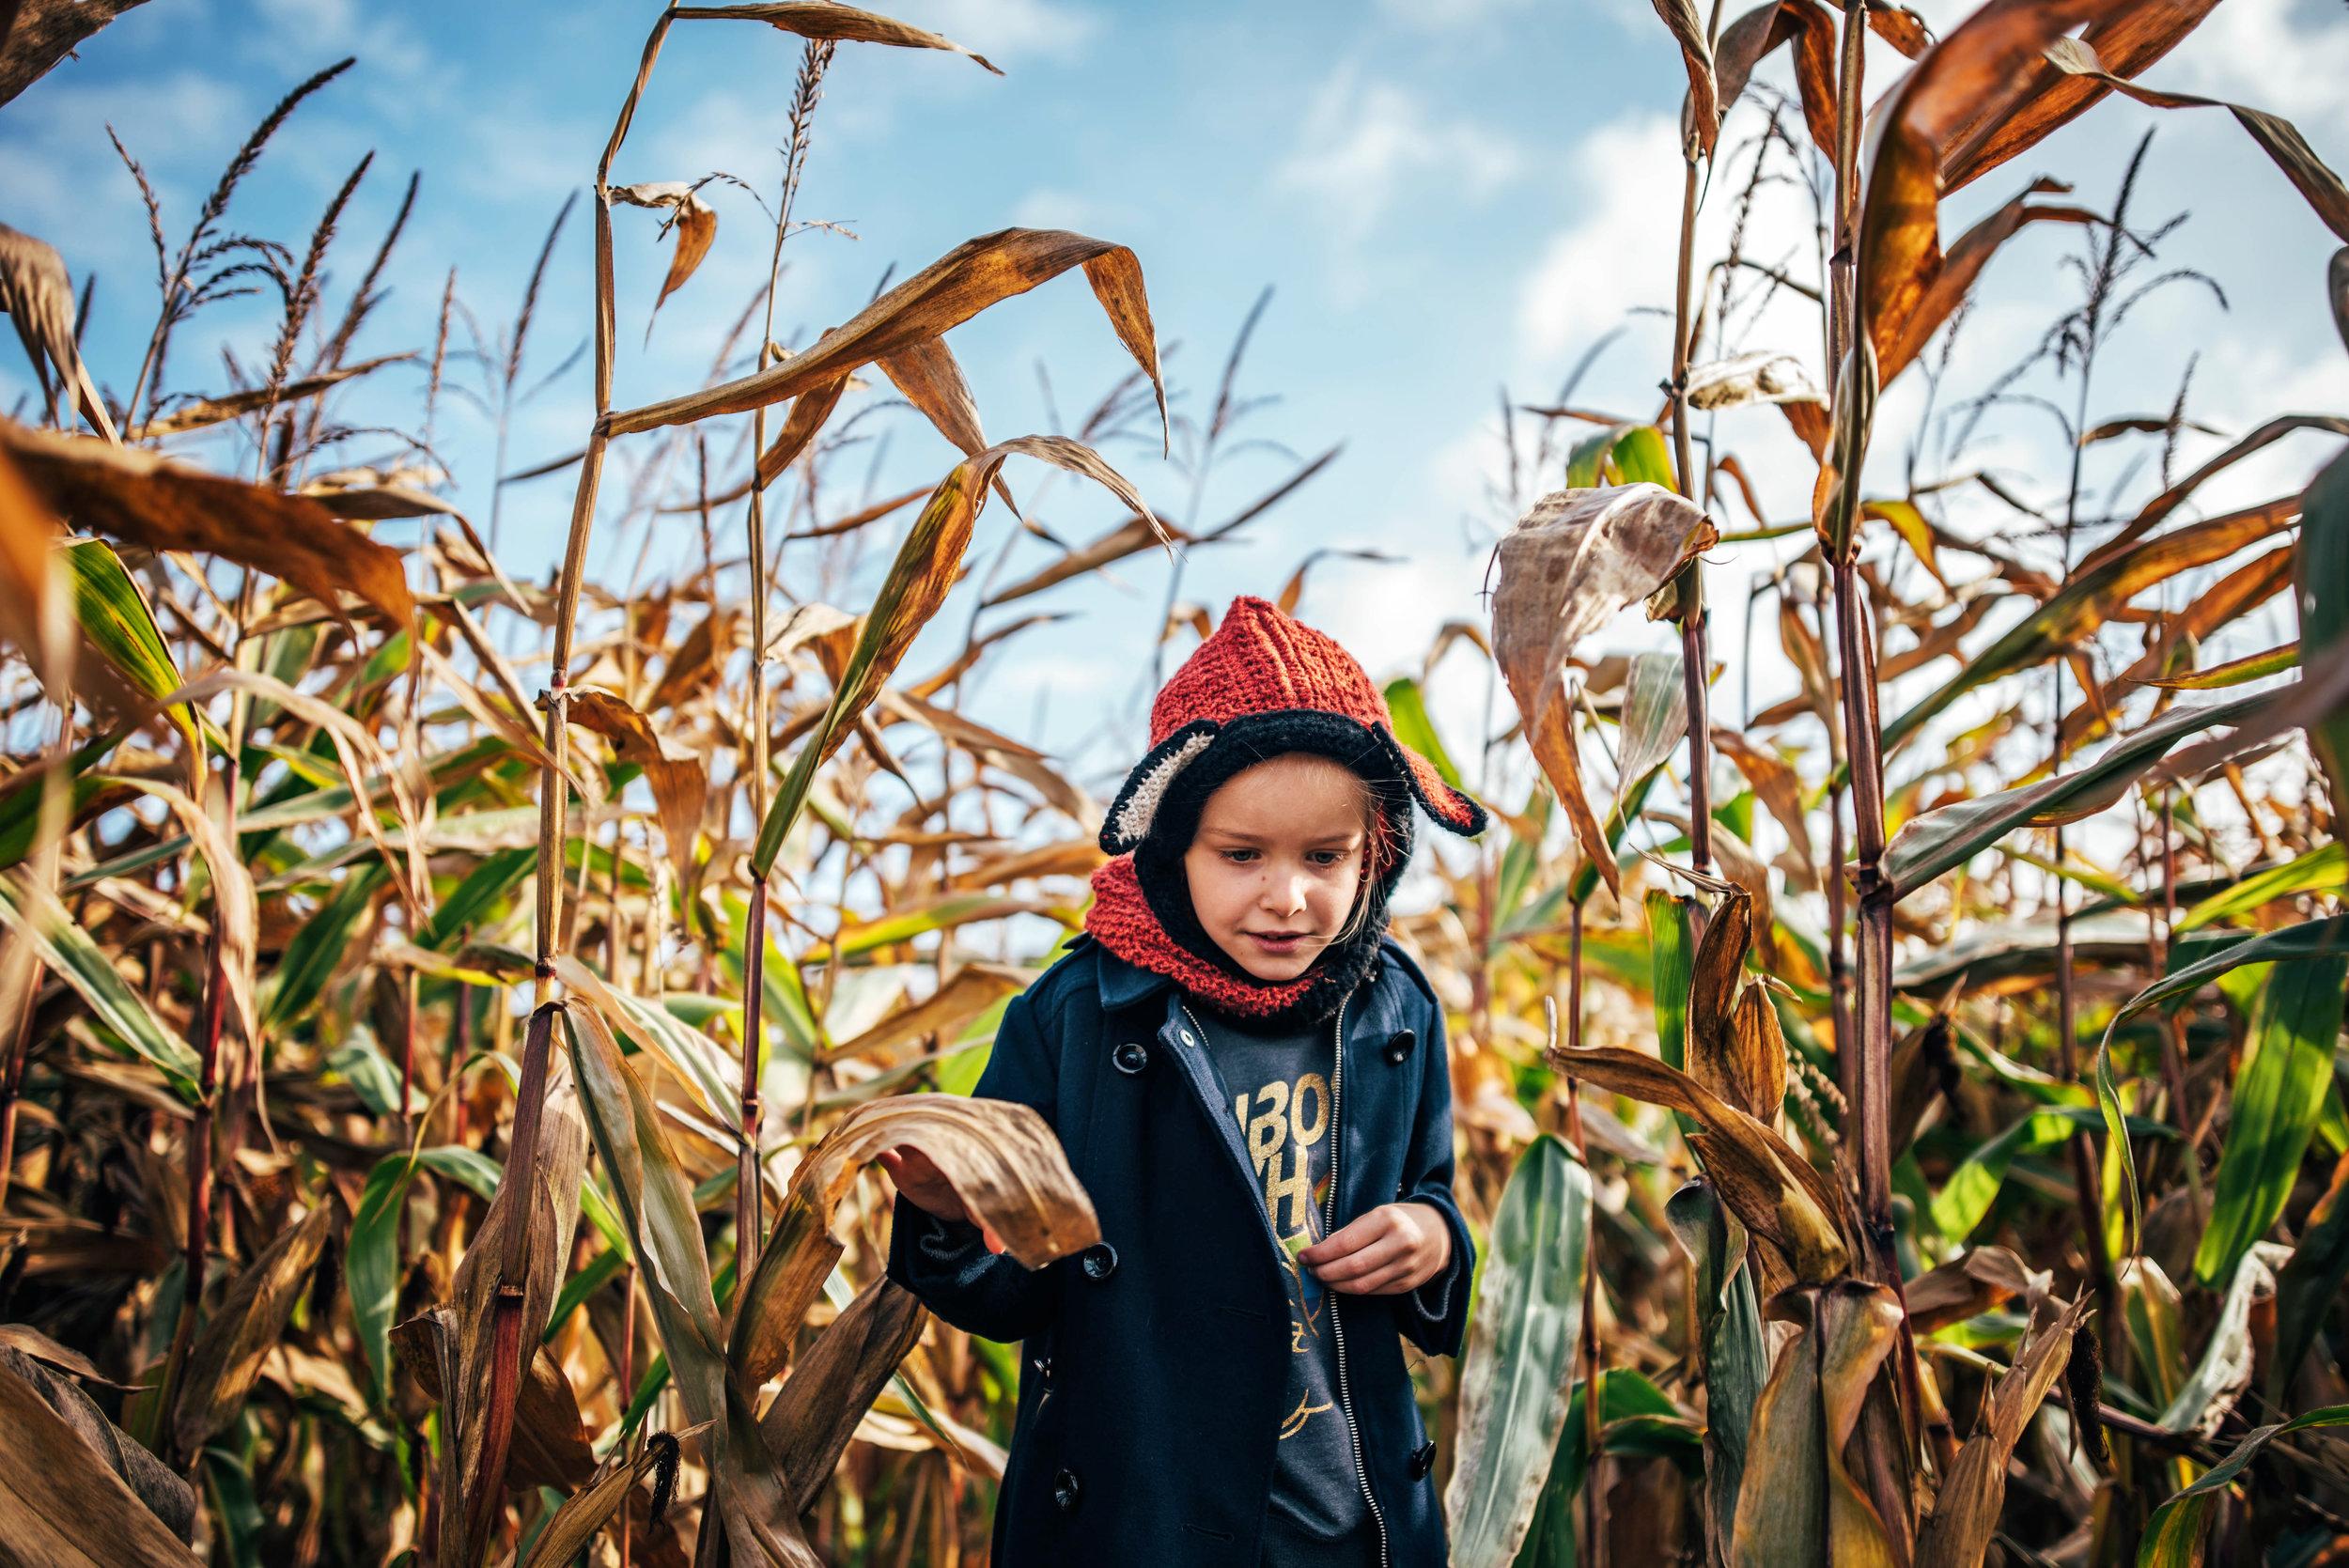 Little Girl in Fox Hat in Corn Maze Essex UK Documentary Portrait Photographer